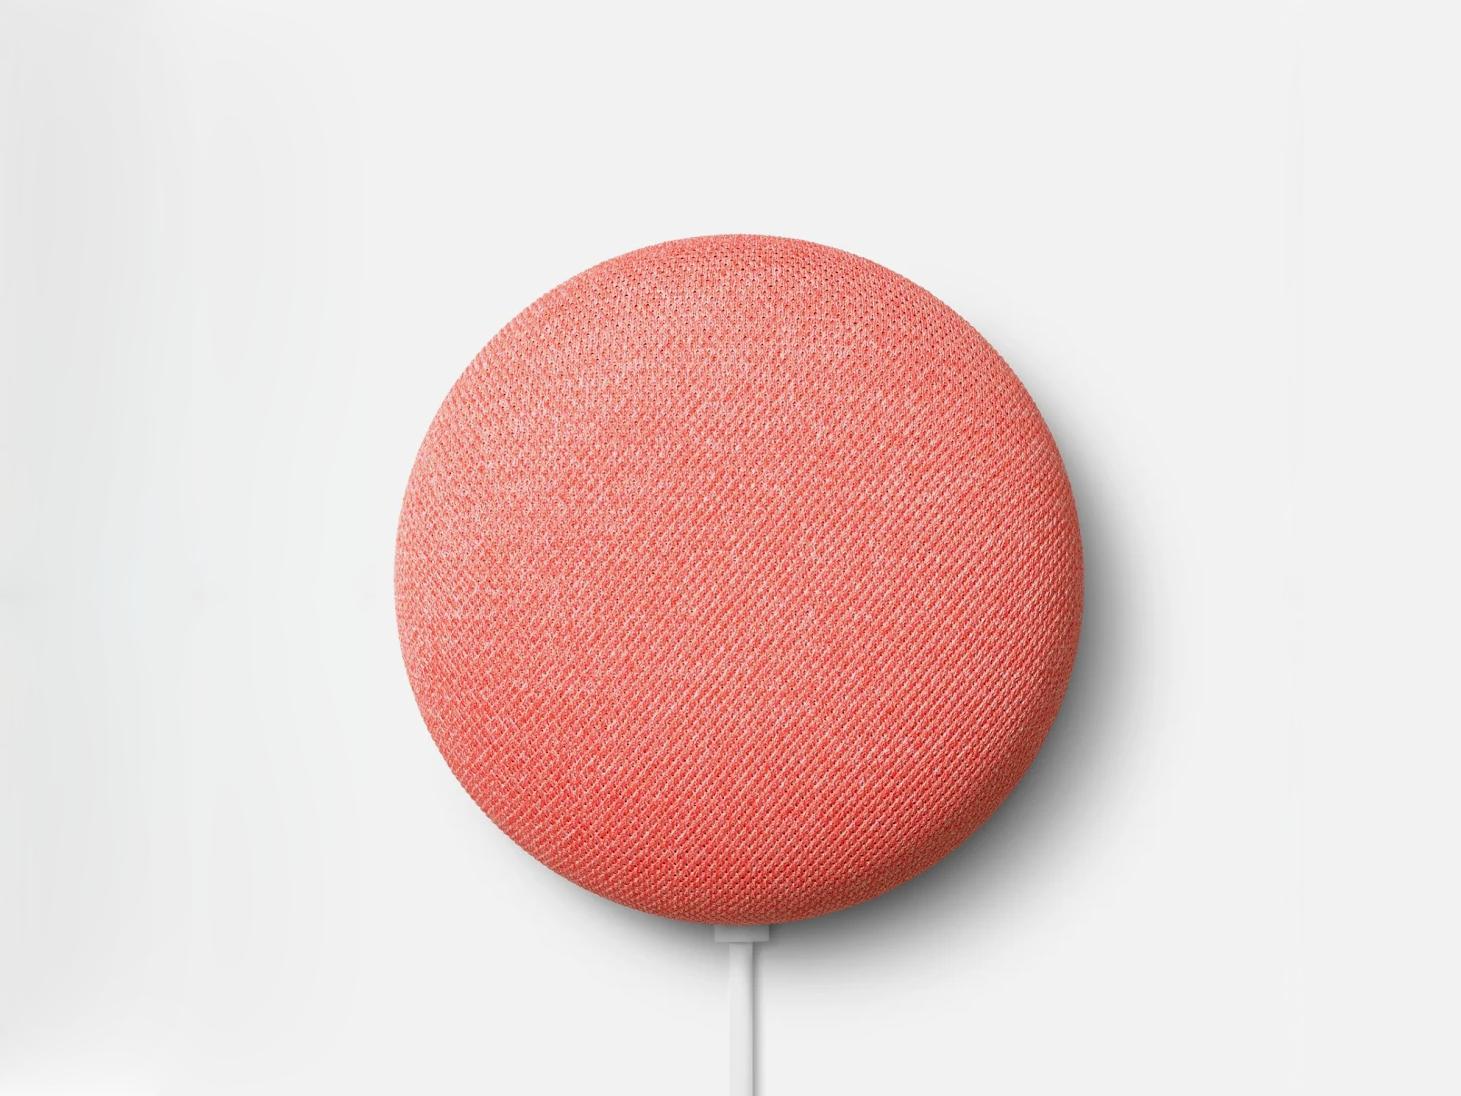 a pink round nest mini speaker on white background